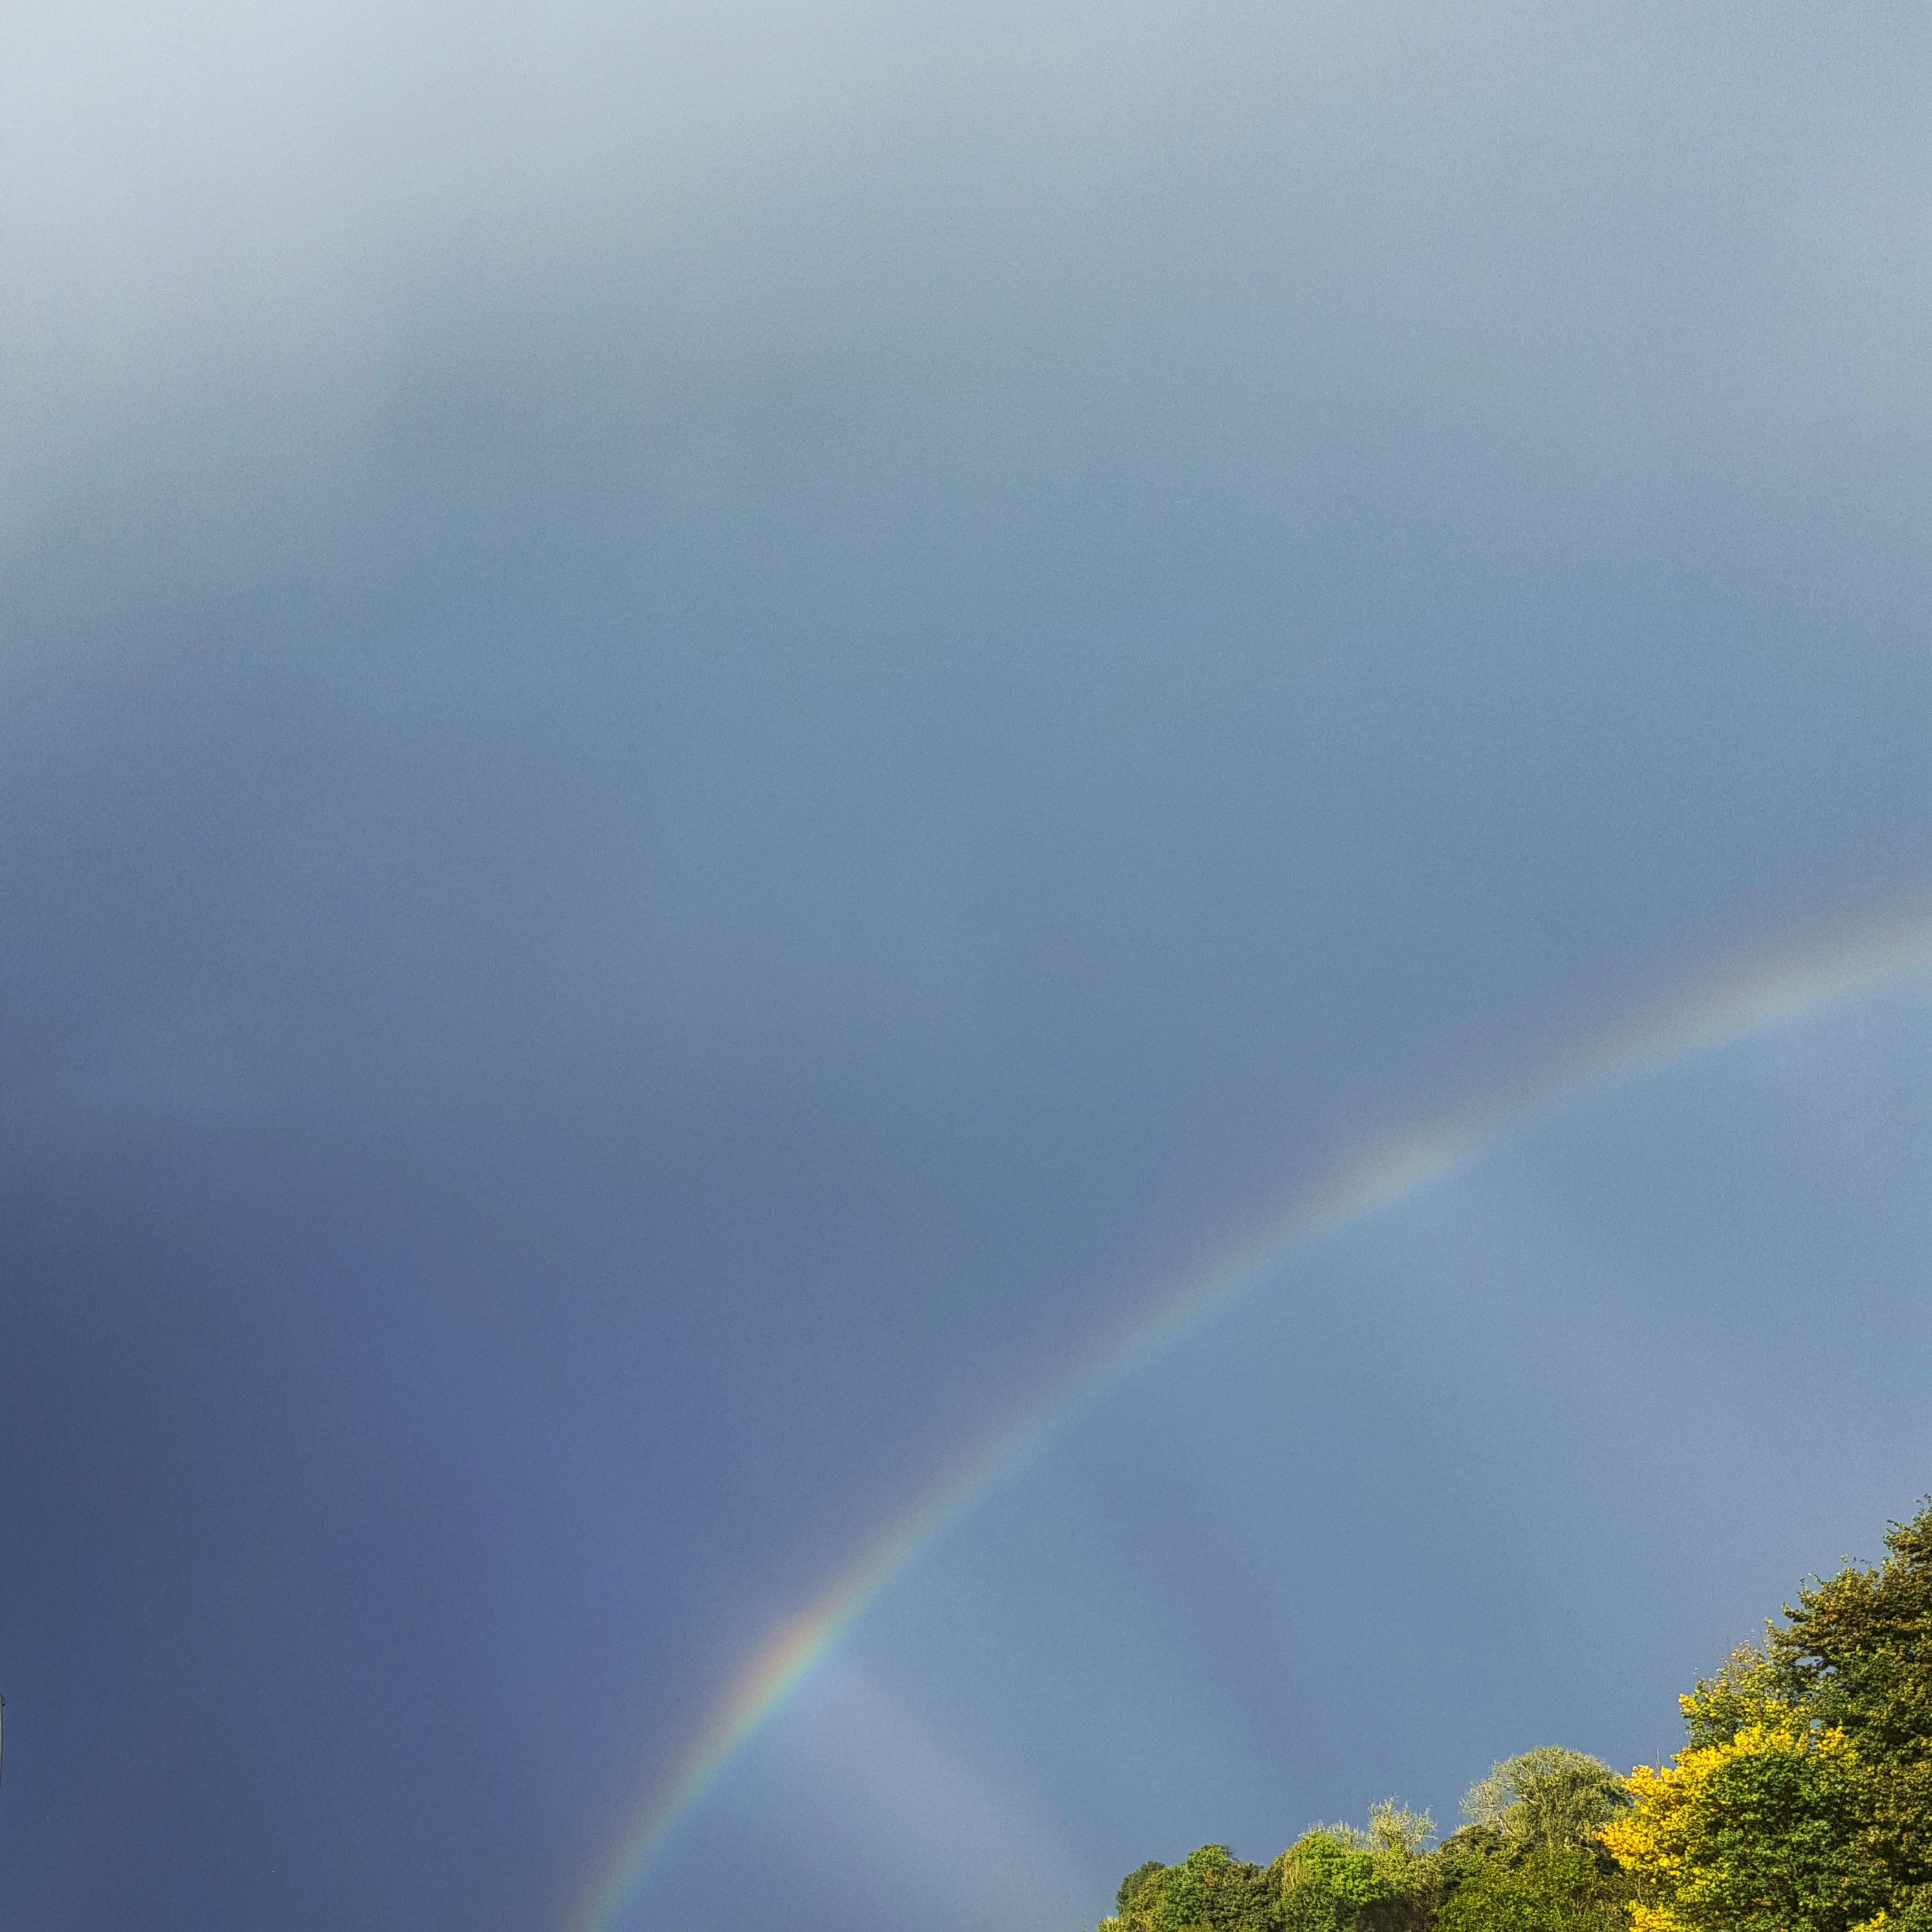 Understanding Depression - The Truths and Myths - The Last Krystallos - Steel Rainbow Sky